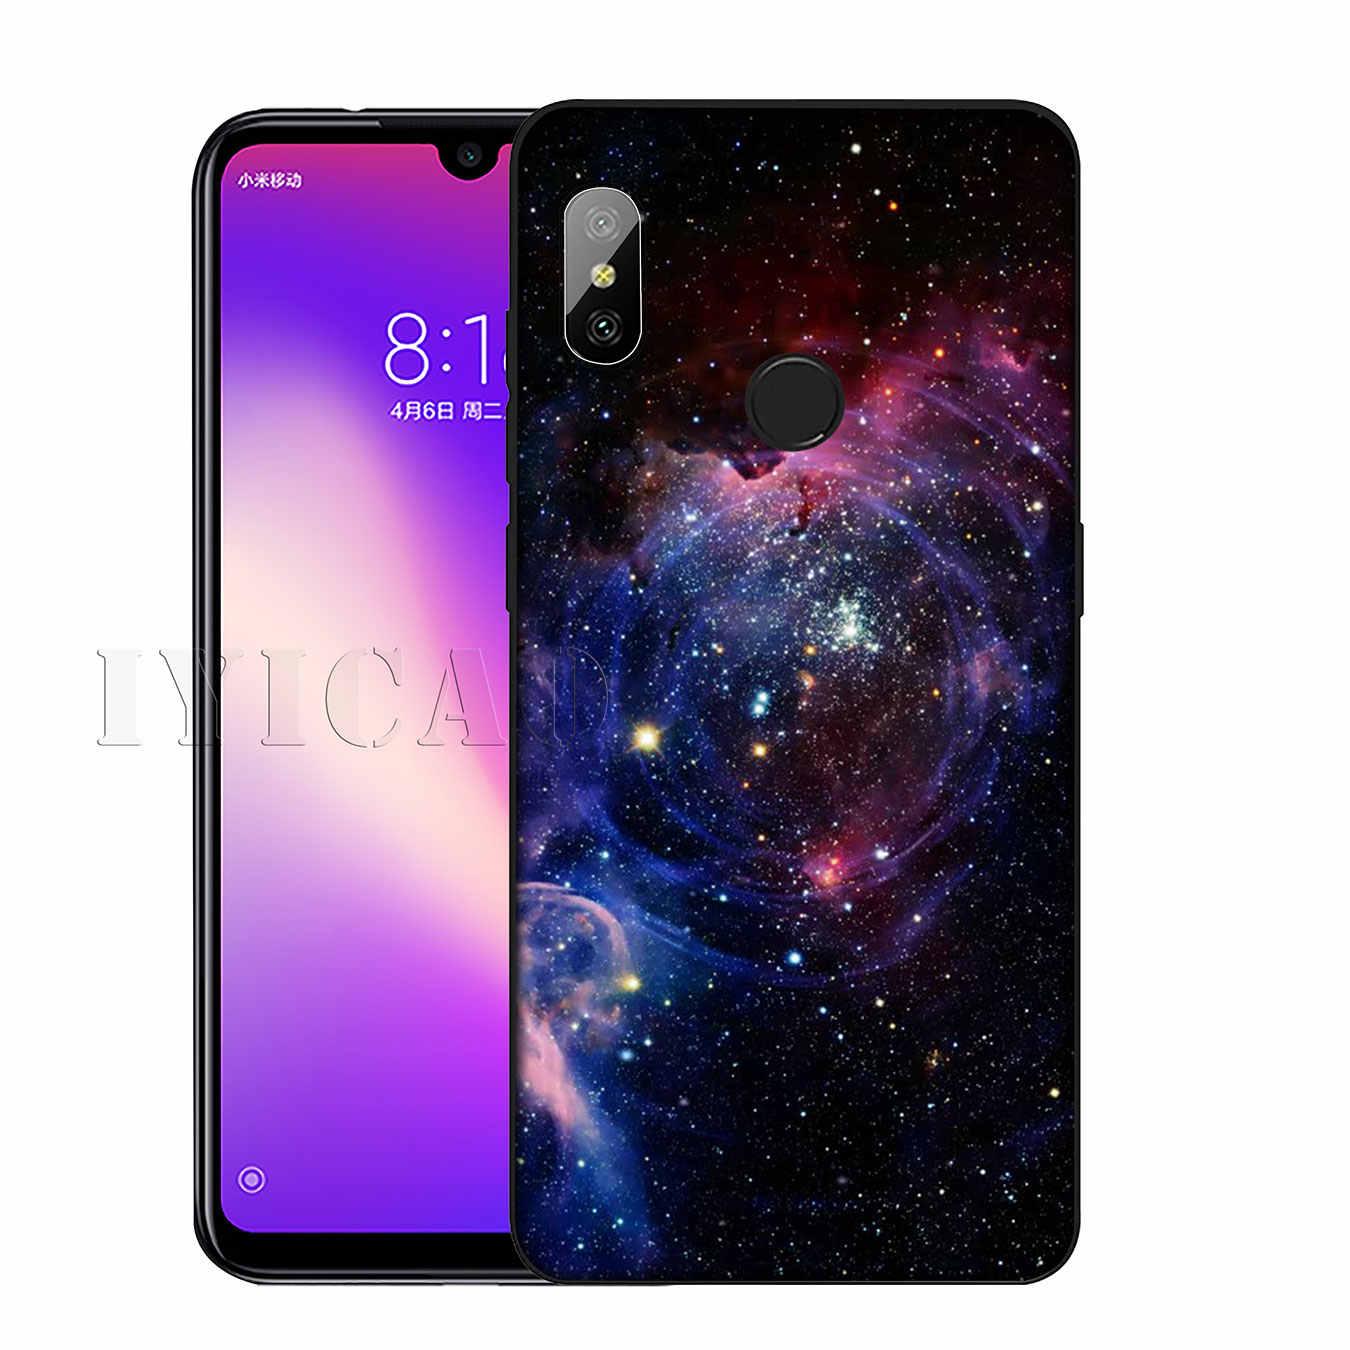 IYICAO สีม่วง Space Star Soft ซิลิโคนโทรศัพท์กรณีสำหรับ Xiaomi Redmi K20 8A 7A 6A 5A S2 4X 4A GO หมายเหตุ 8 7 5 Plus 6 Pro ฝาครอบสีดำ